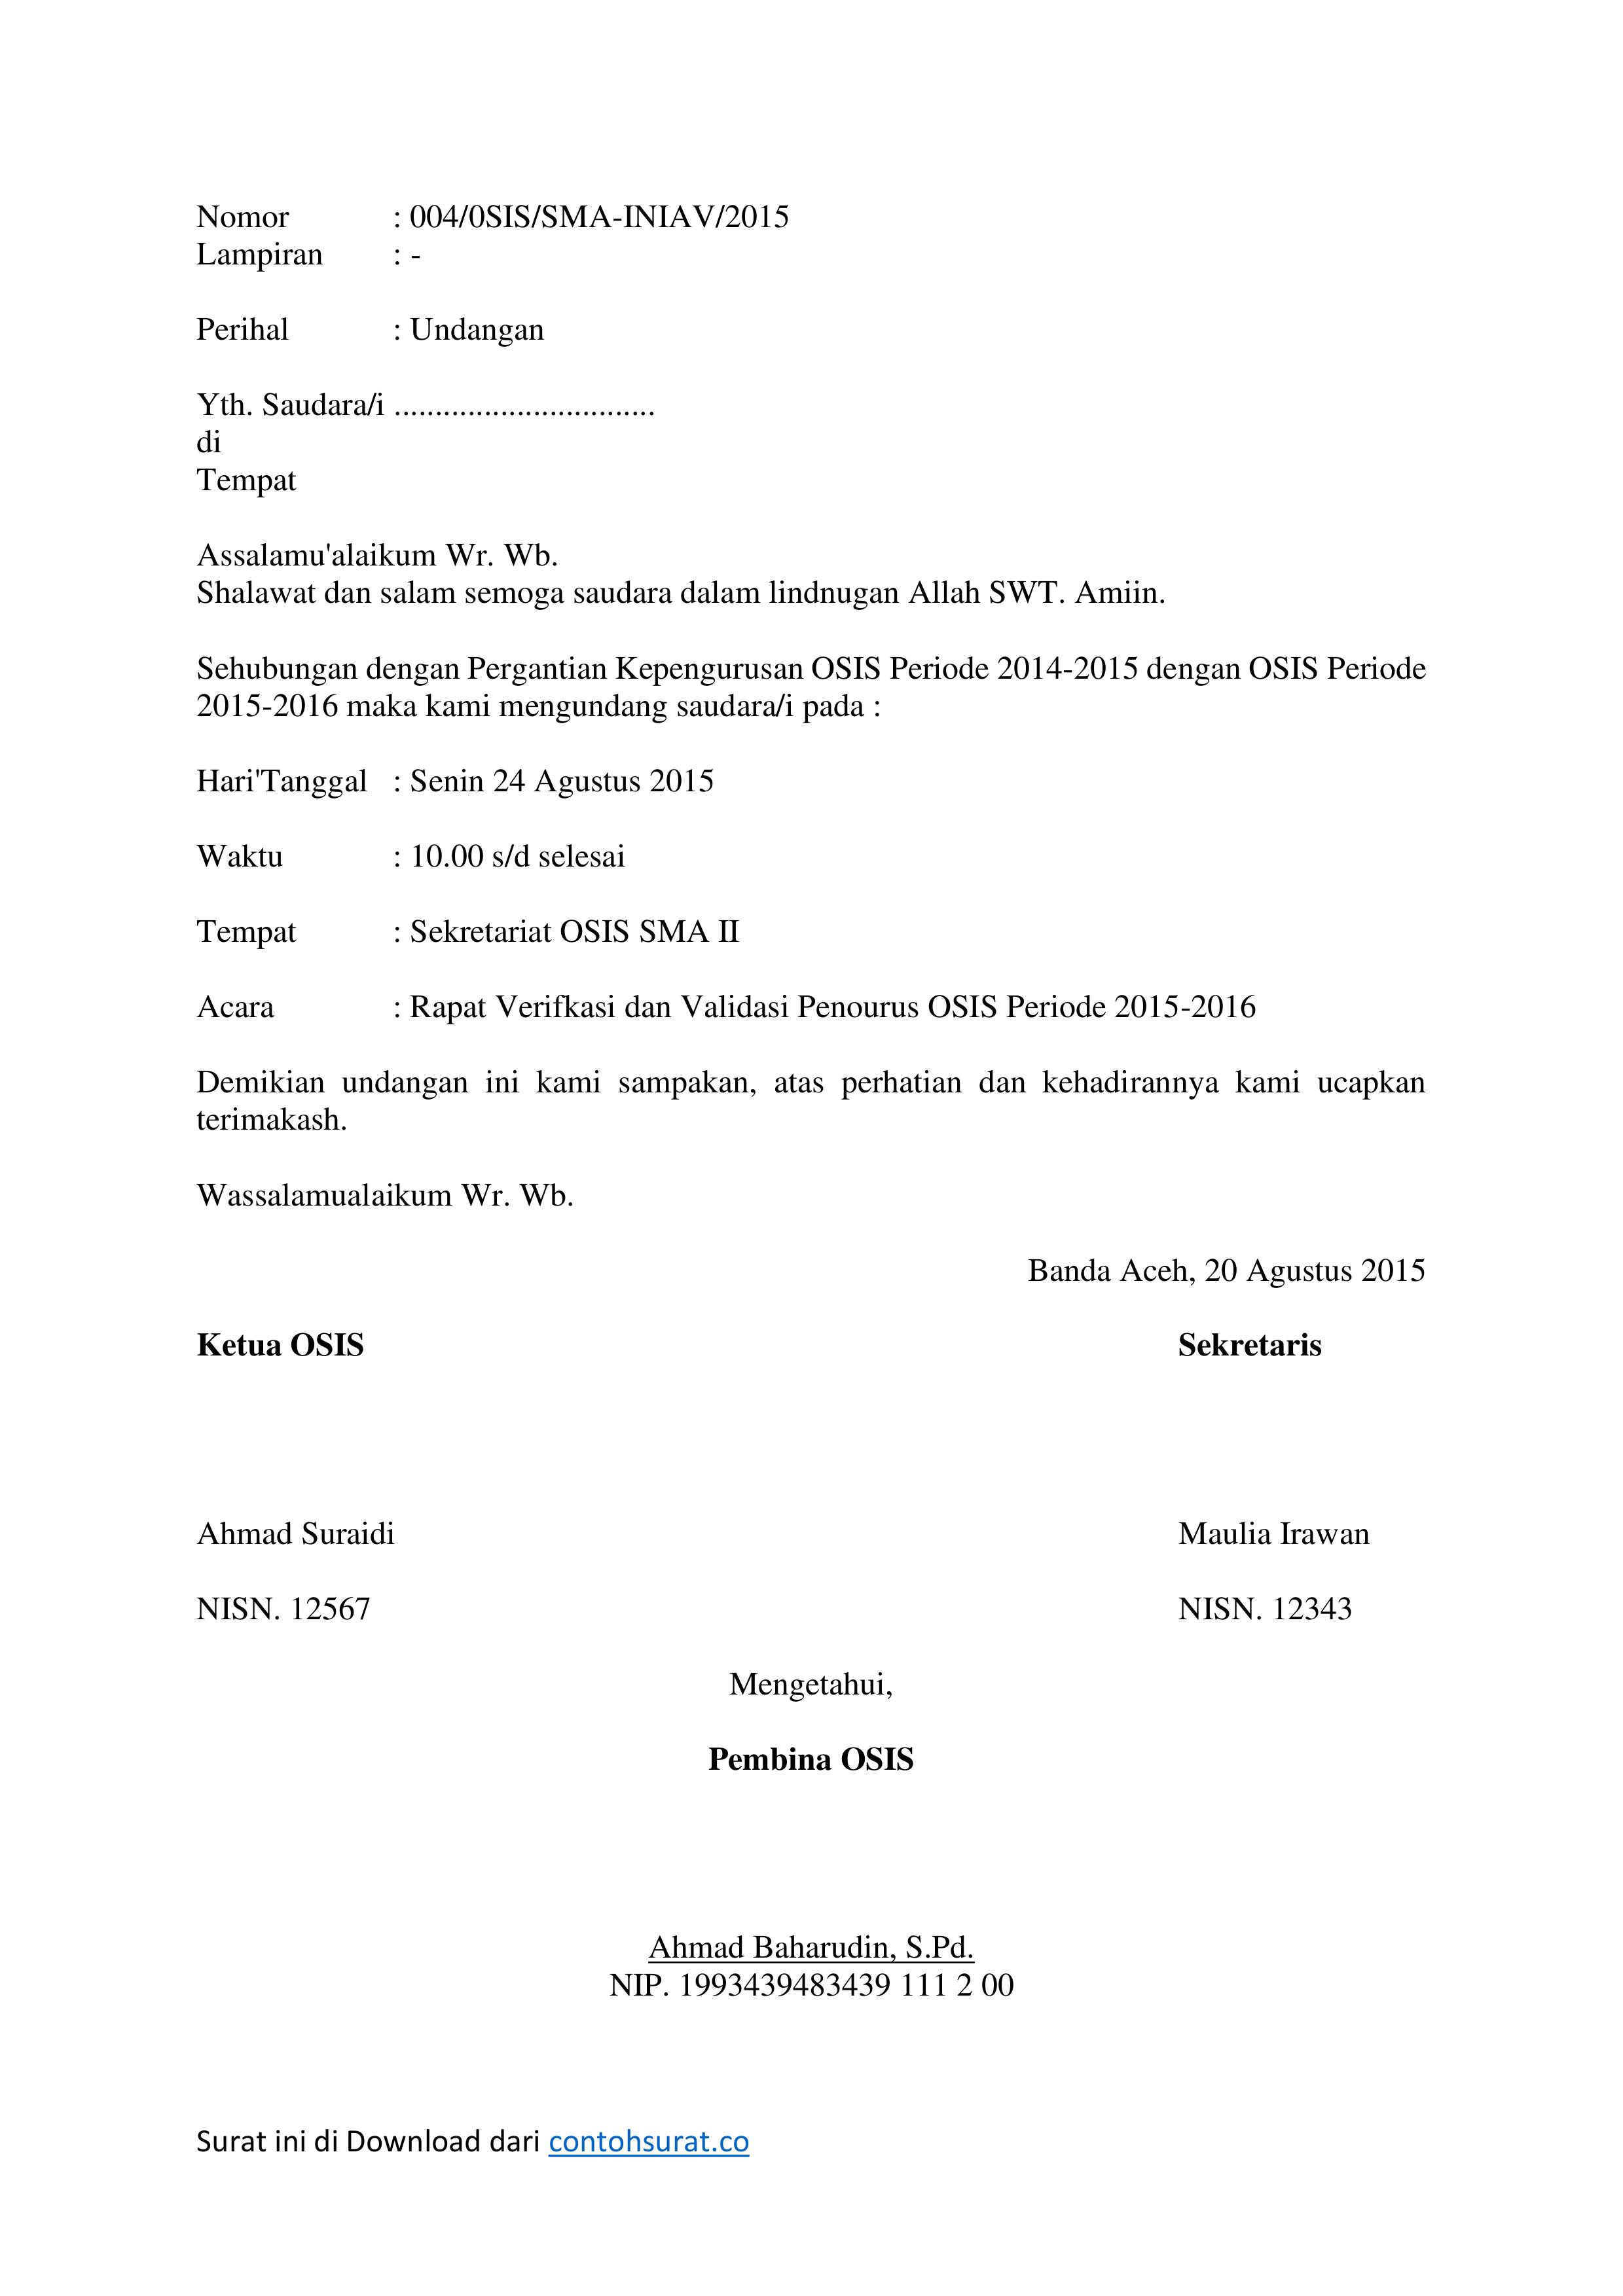 Contoh Surat Undangan Rapat OSIS - Contoh Surat